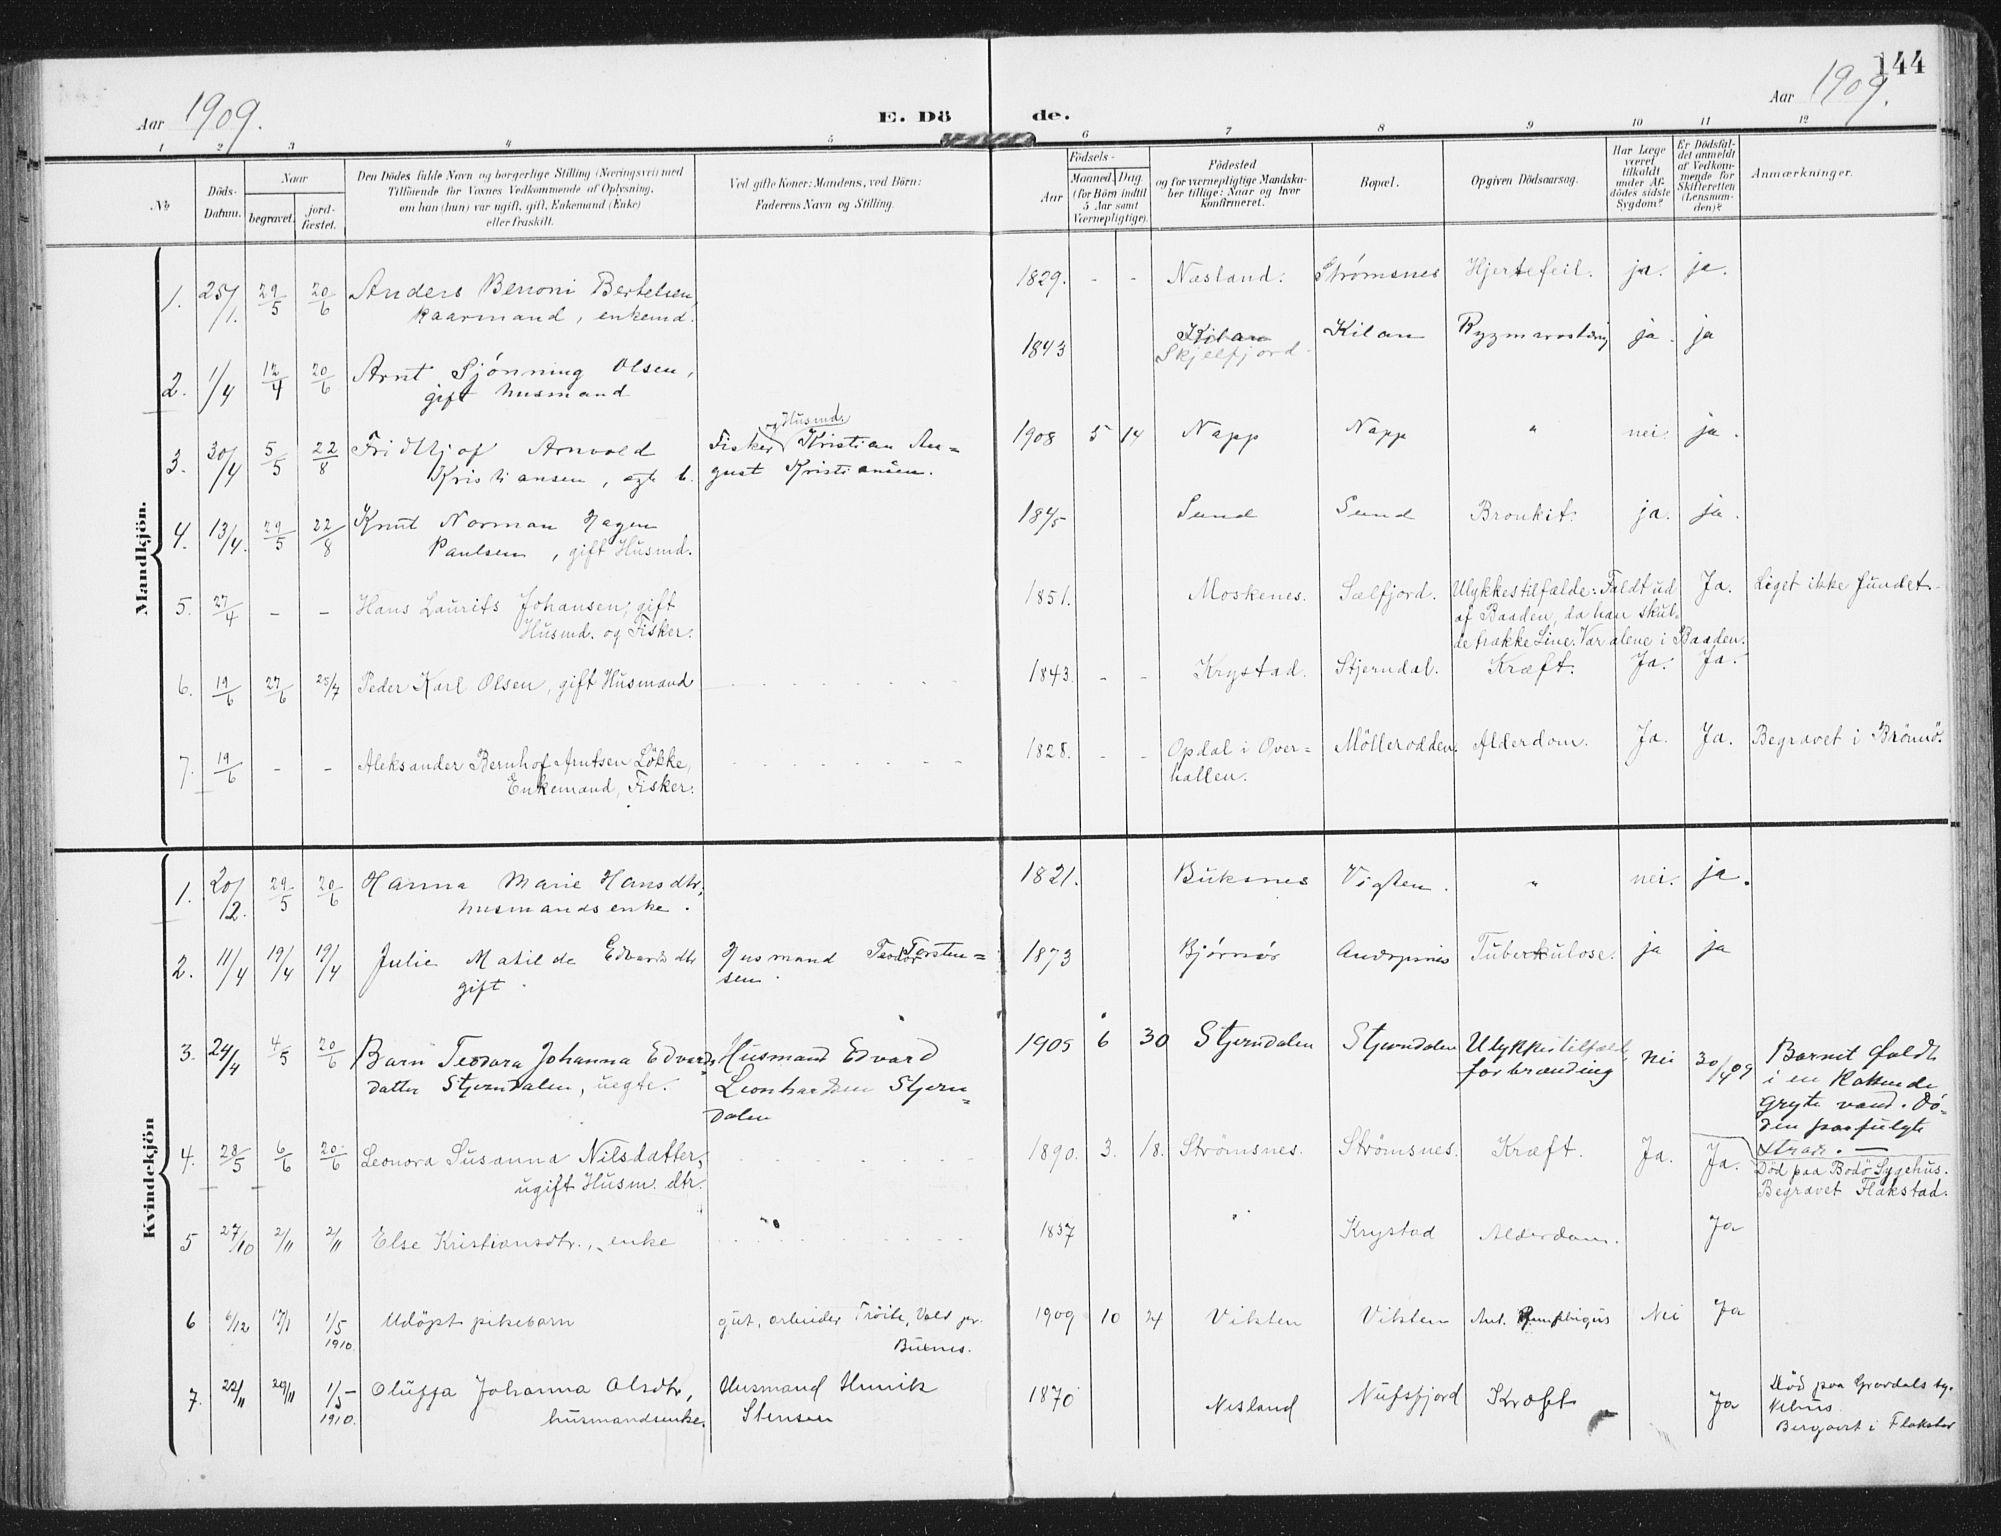 SAT, Ministerialprotokoller, klokkerbøker og fødselsregistre - Nordland, 885/L1206: Ministerialbok nr. 885A07, 1905-1915, s. 144